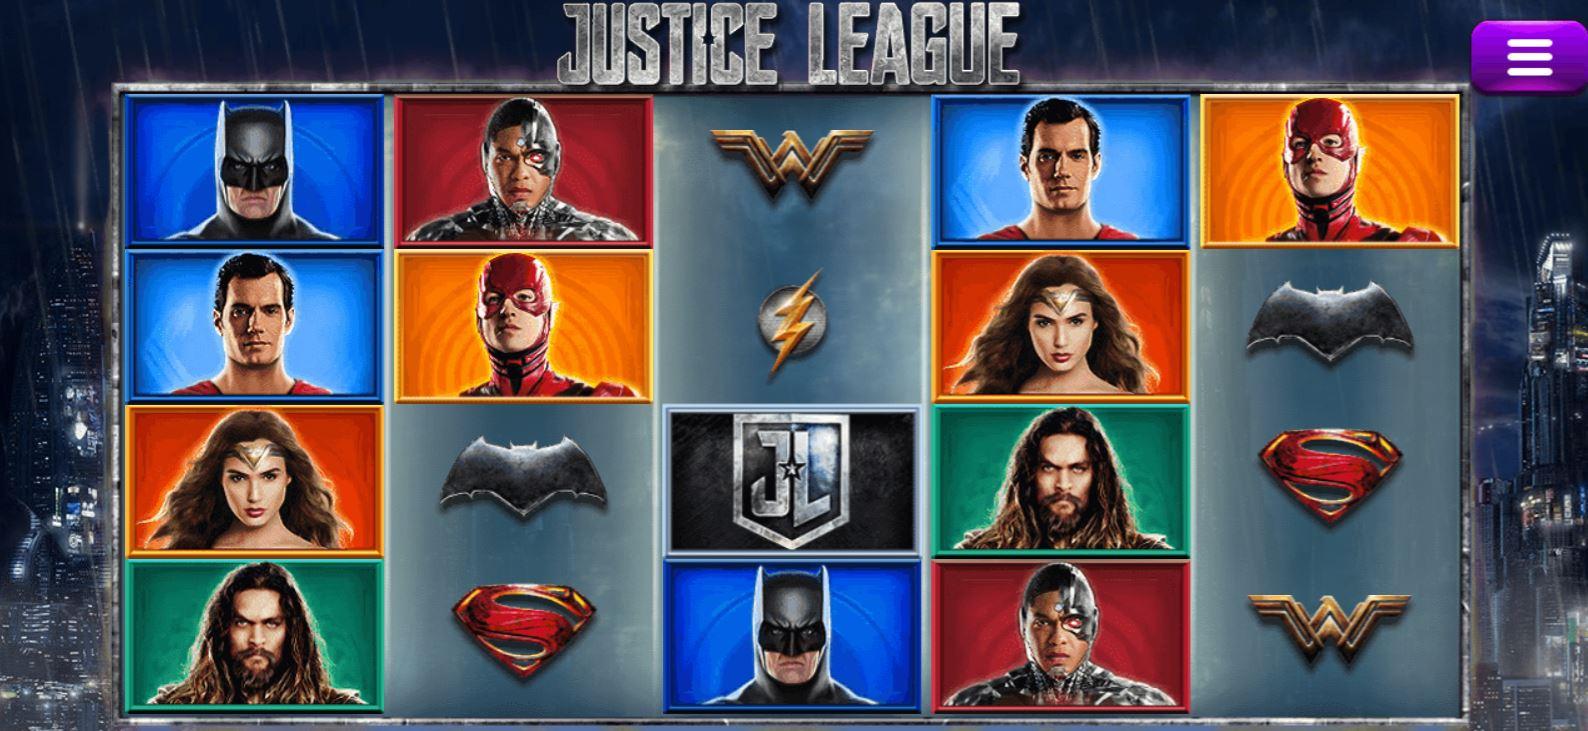 Epicwin-Justice League-ทางเข้า